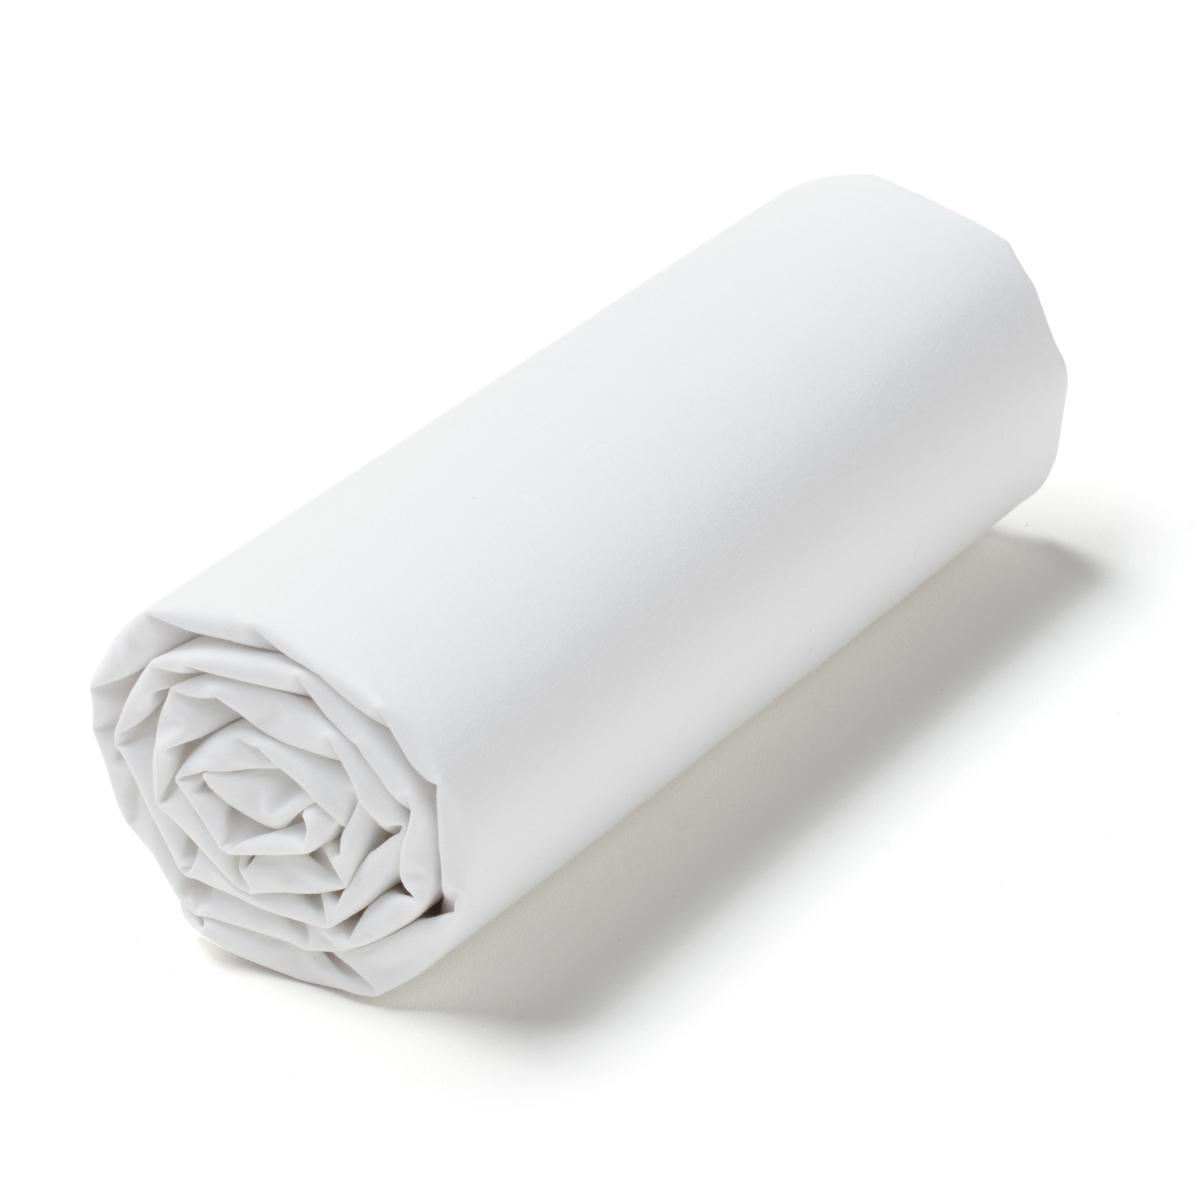 Простыня натяжная из перкали для наматрасника, Oph?lia<br><br>Цвет: белый,черный